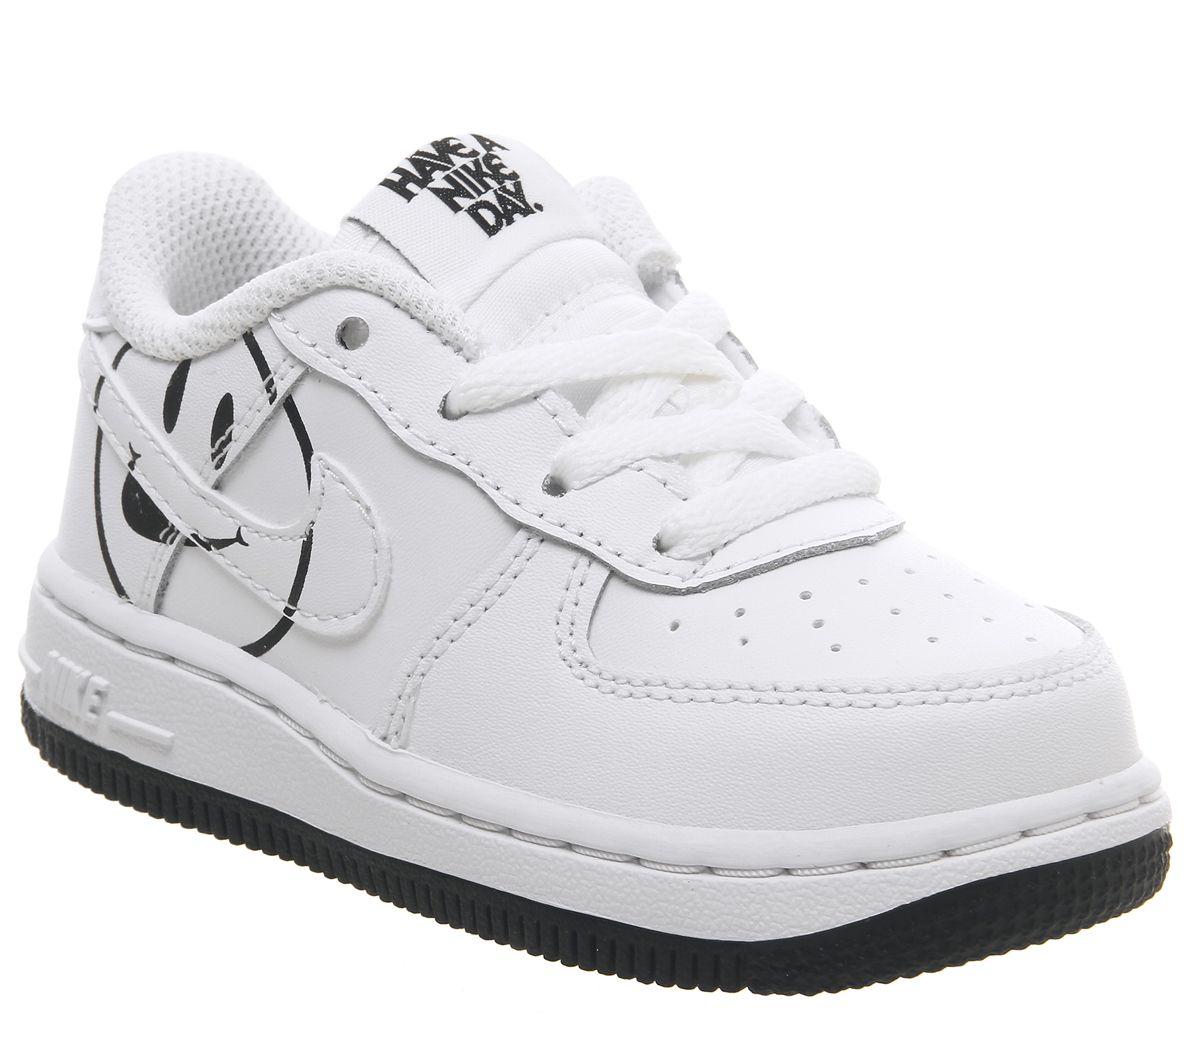 official photos d5491 7e9c3 Nike Air Force 1 Lv8 Trainers White Black Smile - Unisex